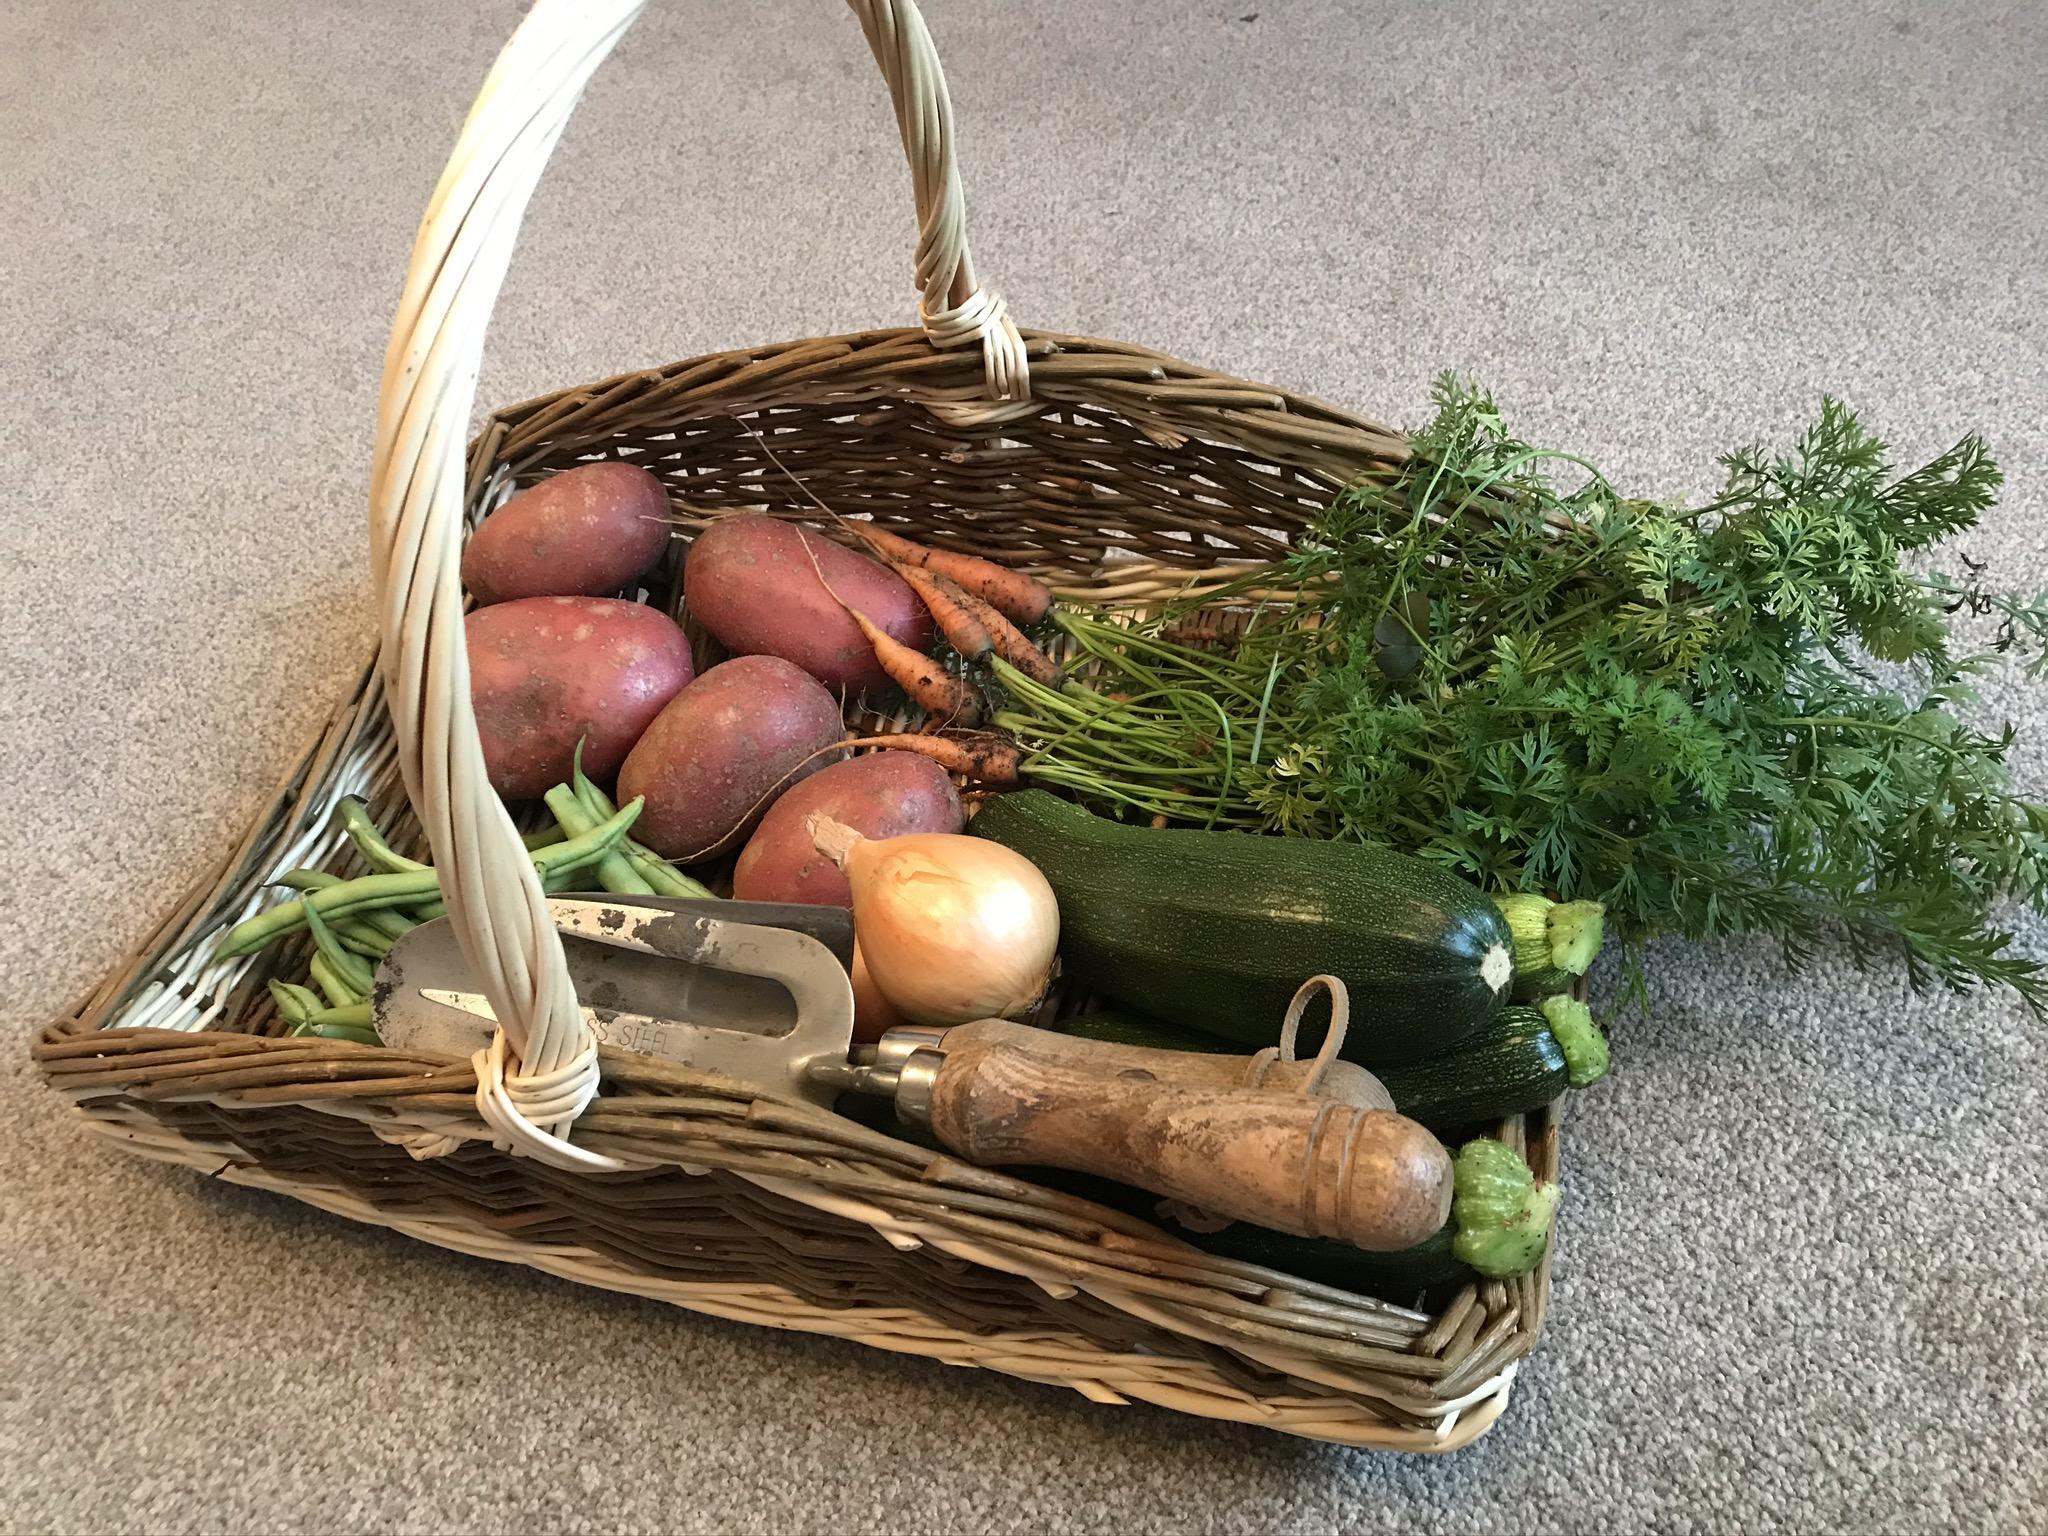 Countryworld Baskets